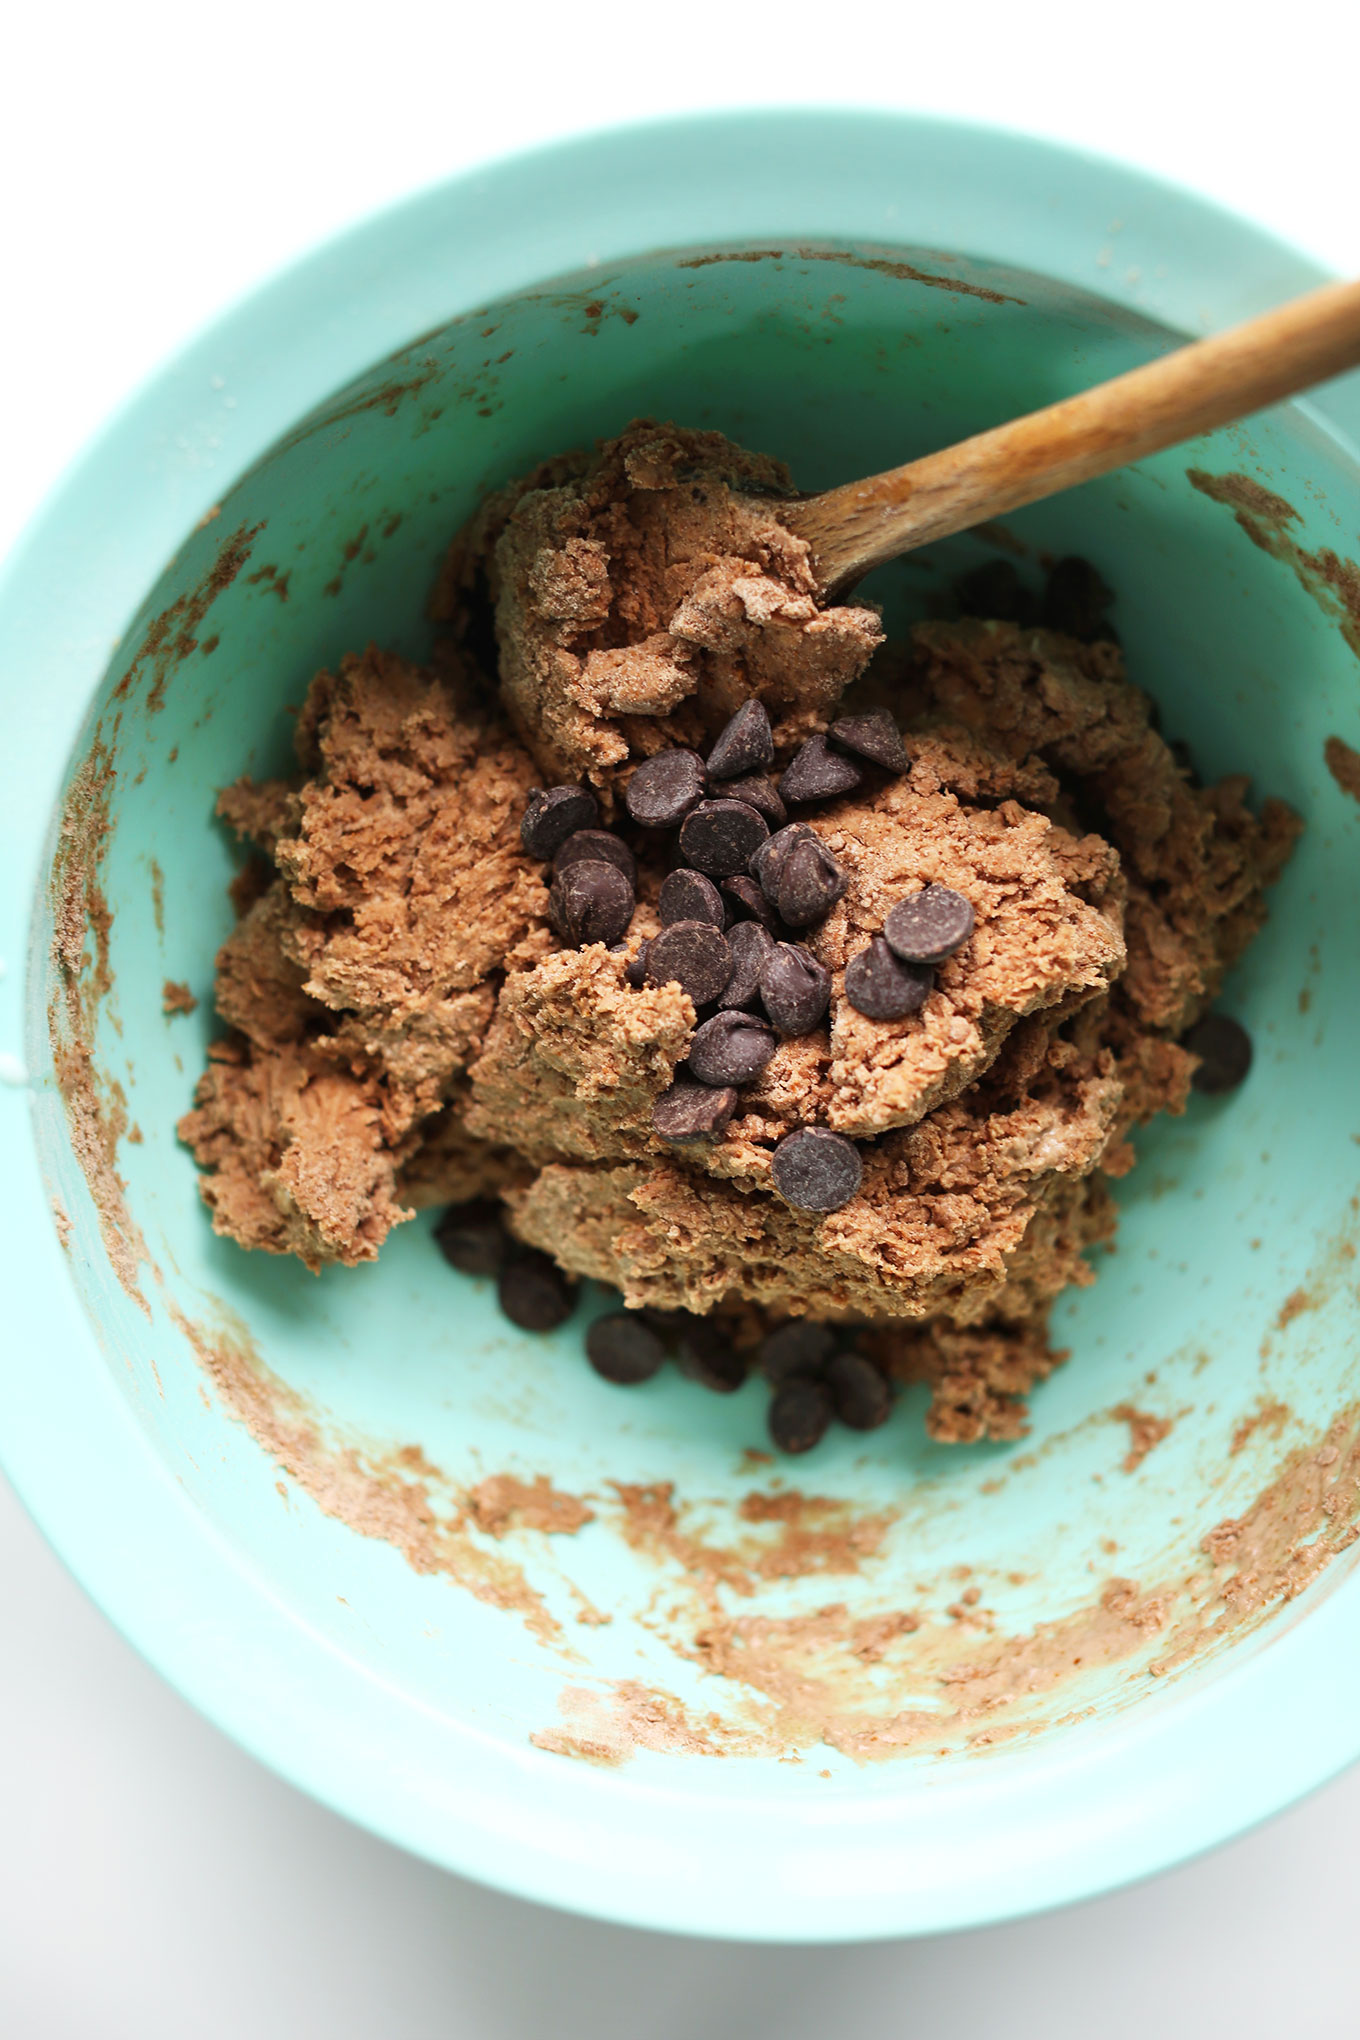 Bowl of Vegan Chocolate Shortcake batter with dark chocolate chips